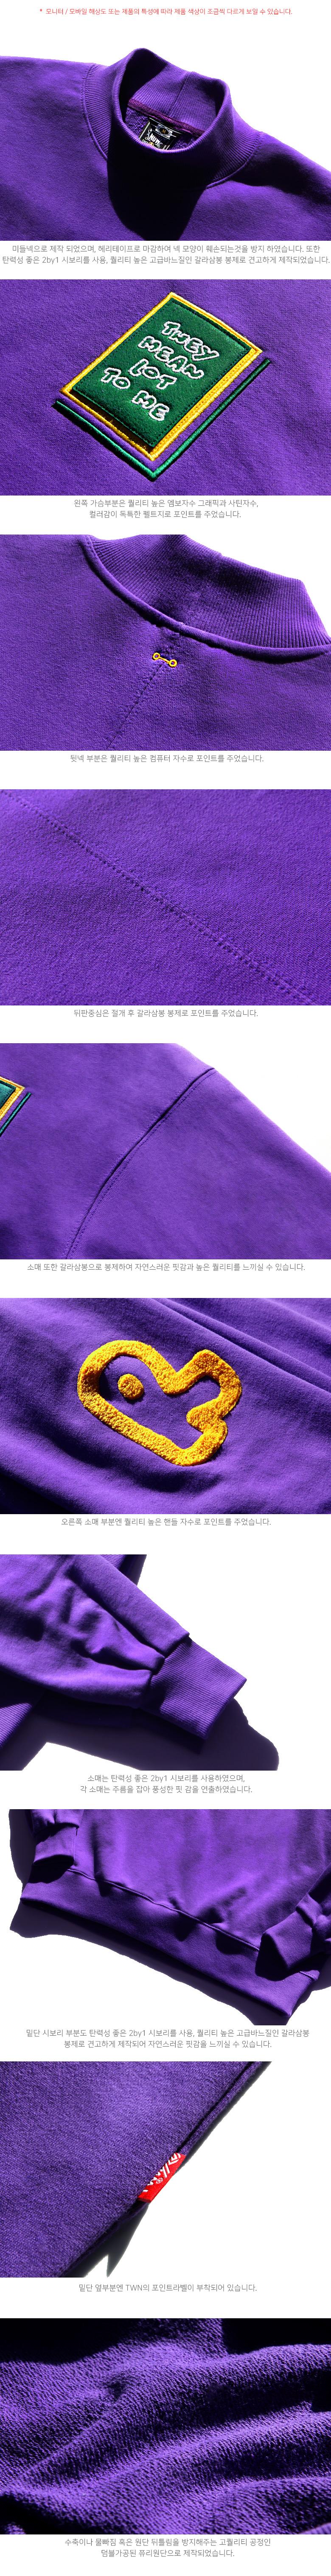 20190121_twn_theymean_detail_violet_je_02.jpg